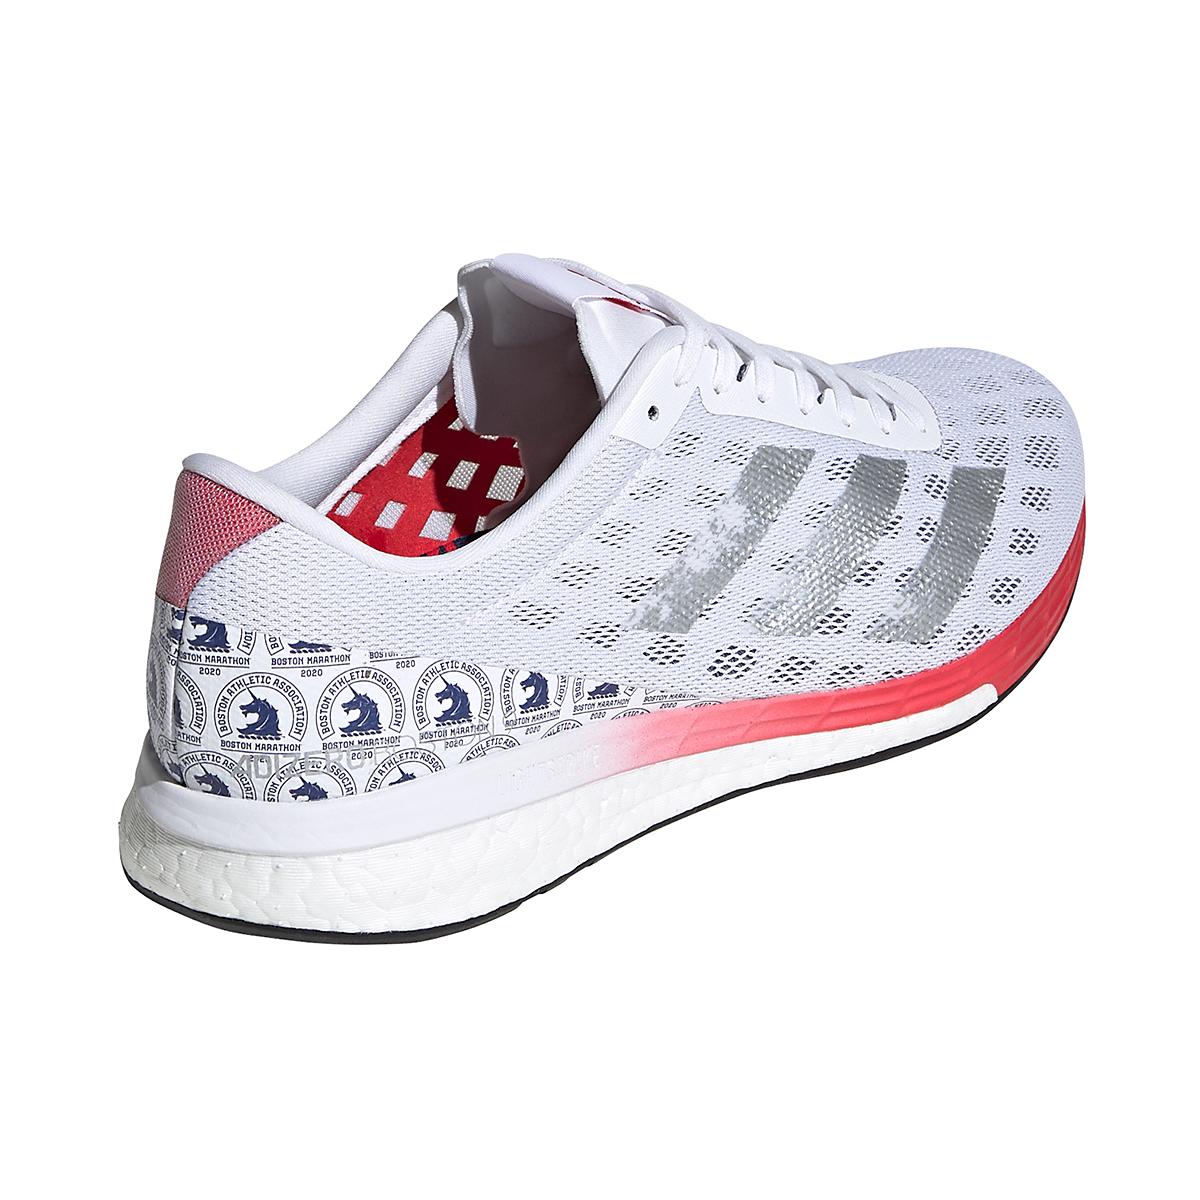 Men's Adidas Adizero Boston 9 Running Shoe - Color: Cloud White/Silver Metallic/Scarlet - Size: 8 - Width: Regular, Cloud White/Silver Metallic/Scarlet, large, image 3